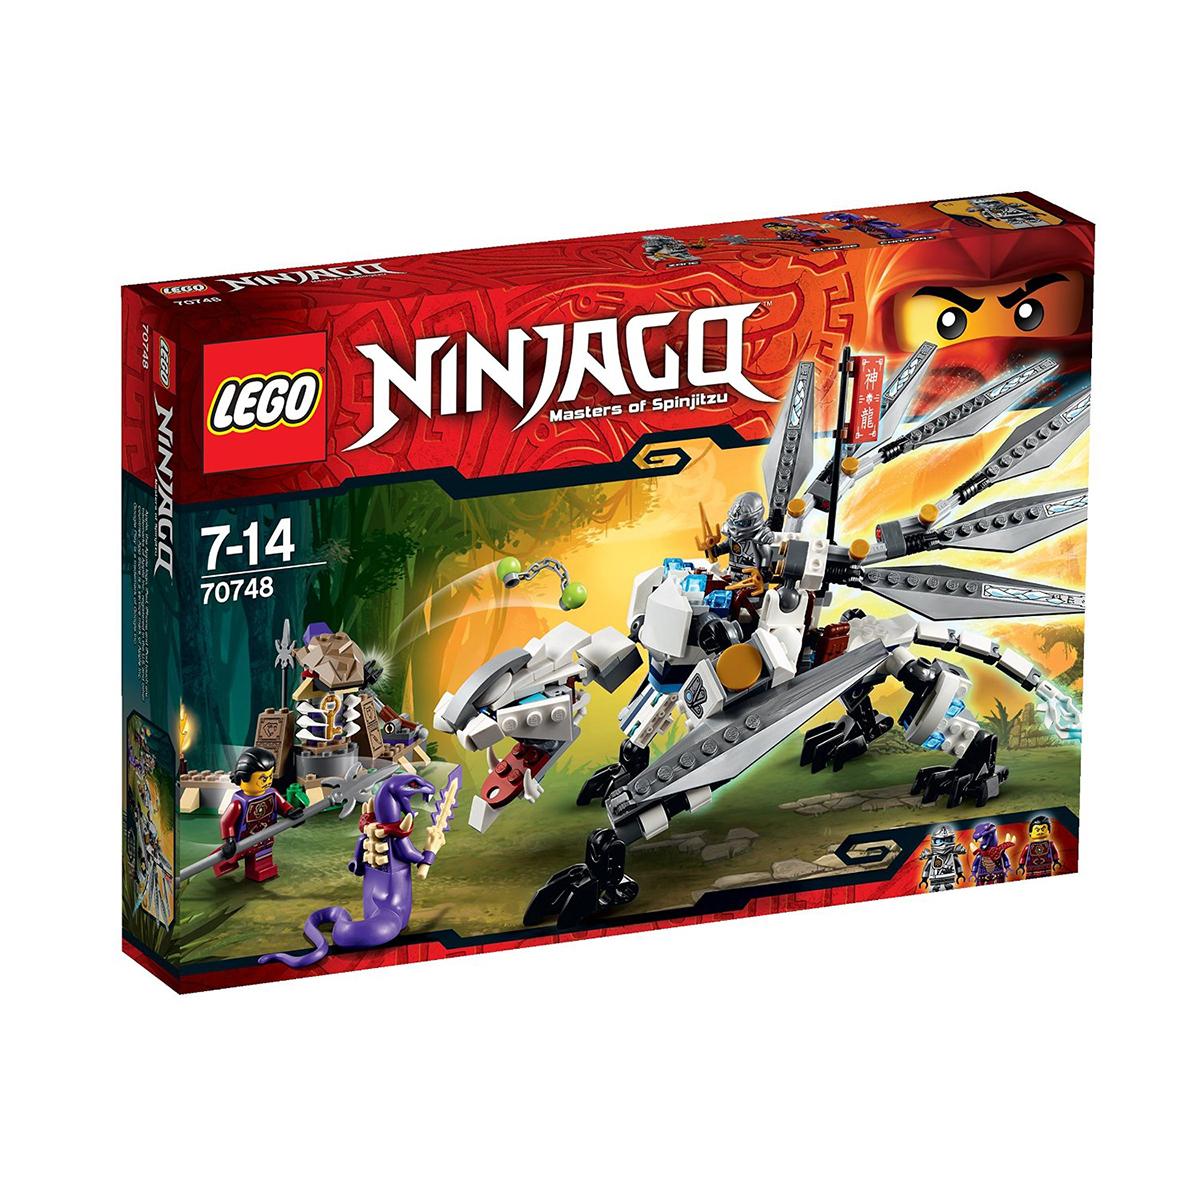 LEGO Ninjago 70748 – Rong than Titan